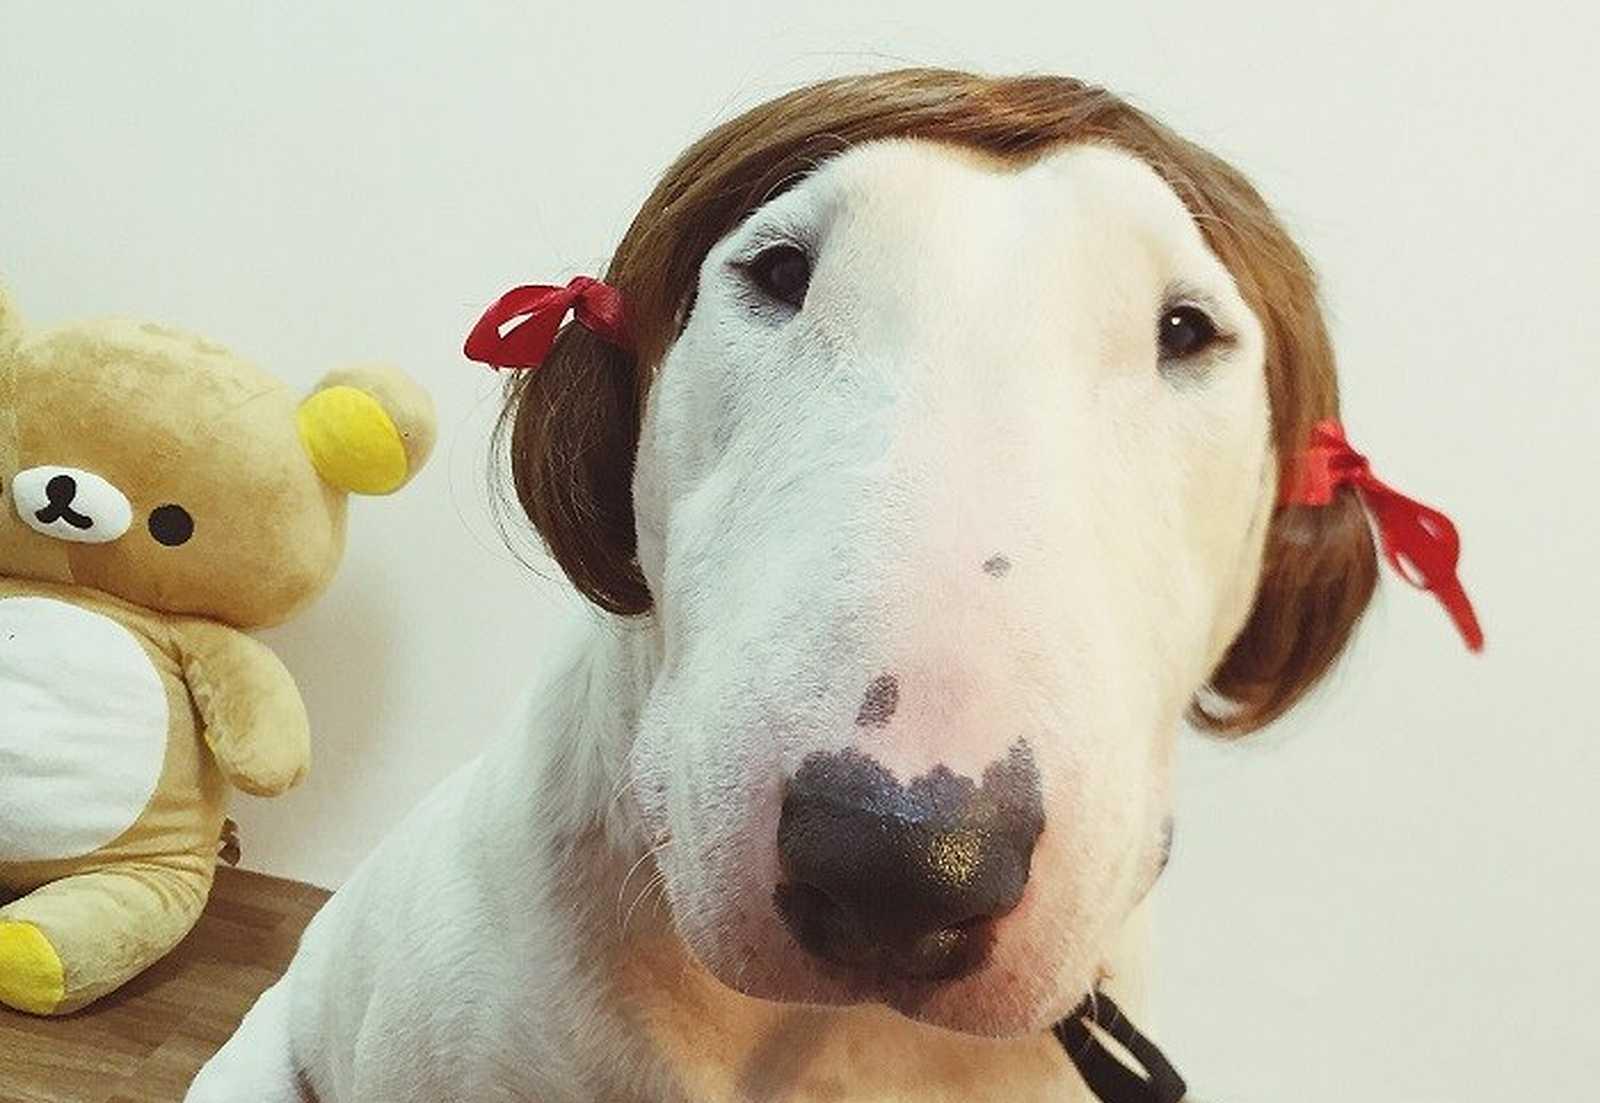 a dog wearing a wig